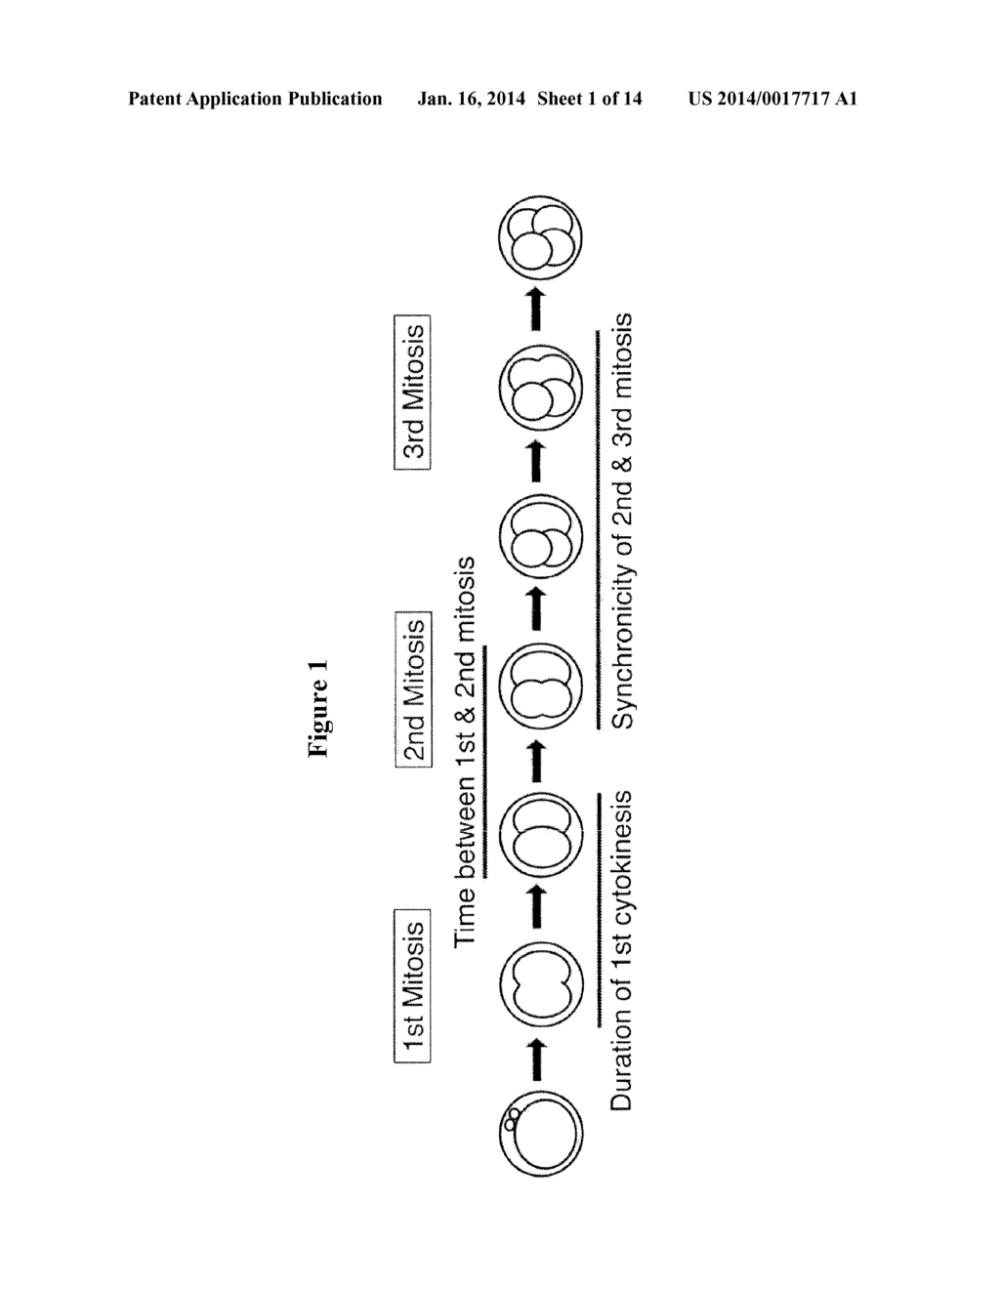 medium resolution of in vitro embryo blastocyst prediction methods diagram schematic and image 02